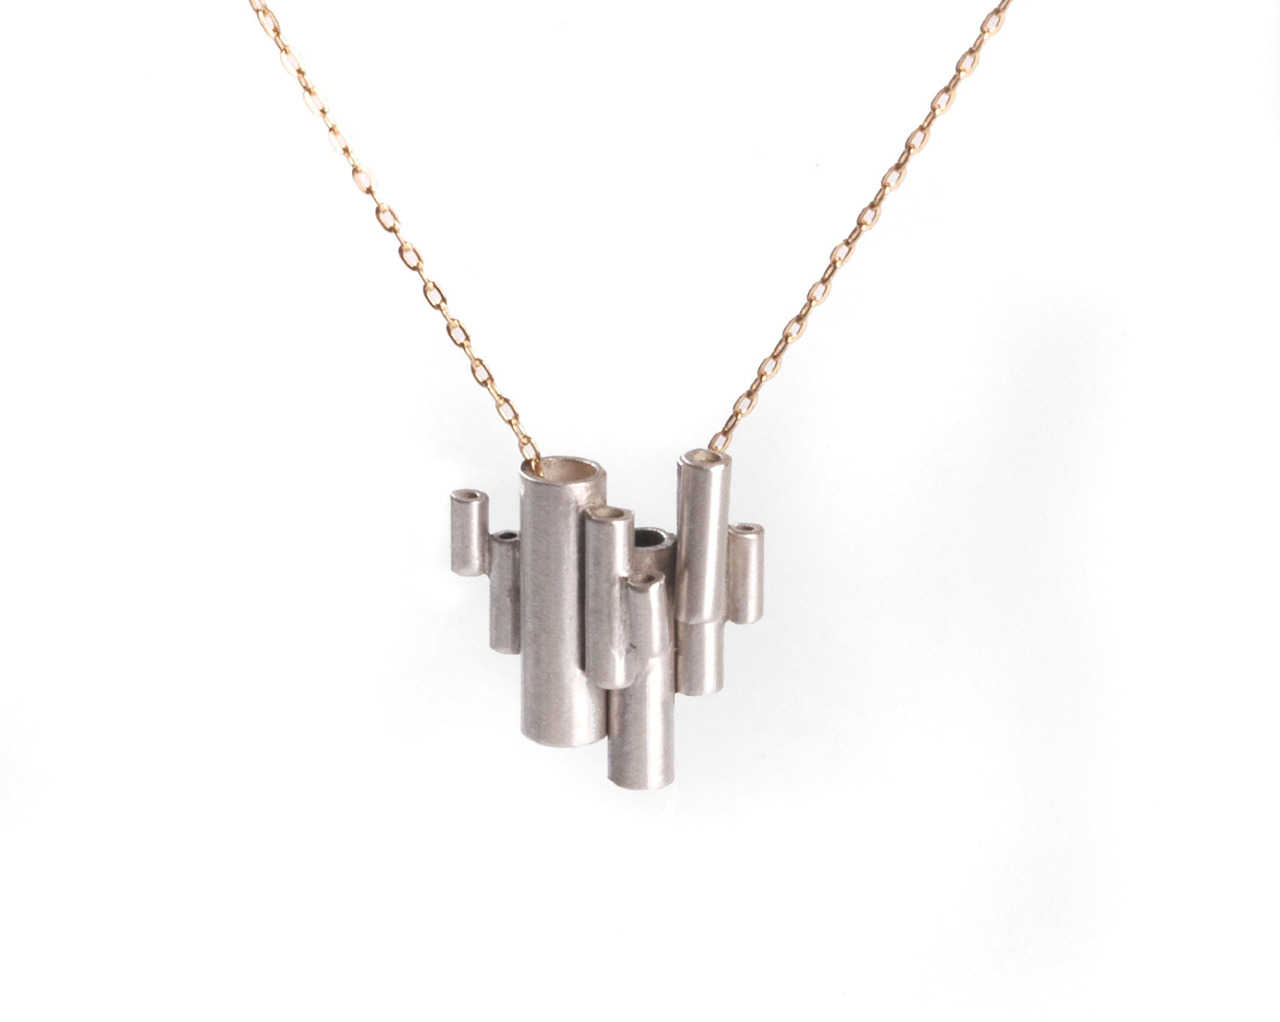 www.reneeruin.com: Dev Bennett // Handcrafted Jewelry Designs